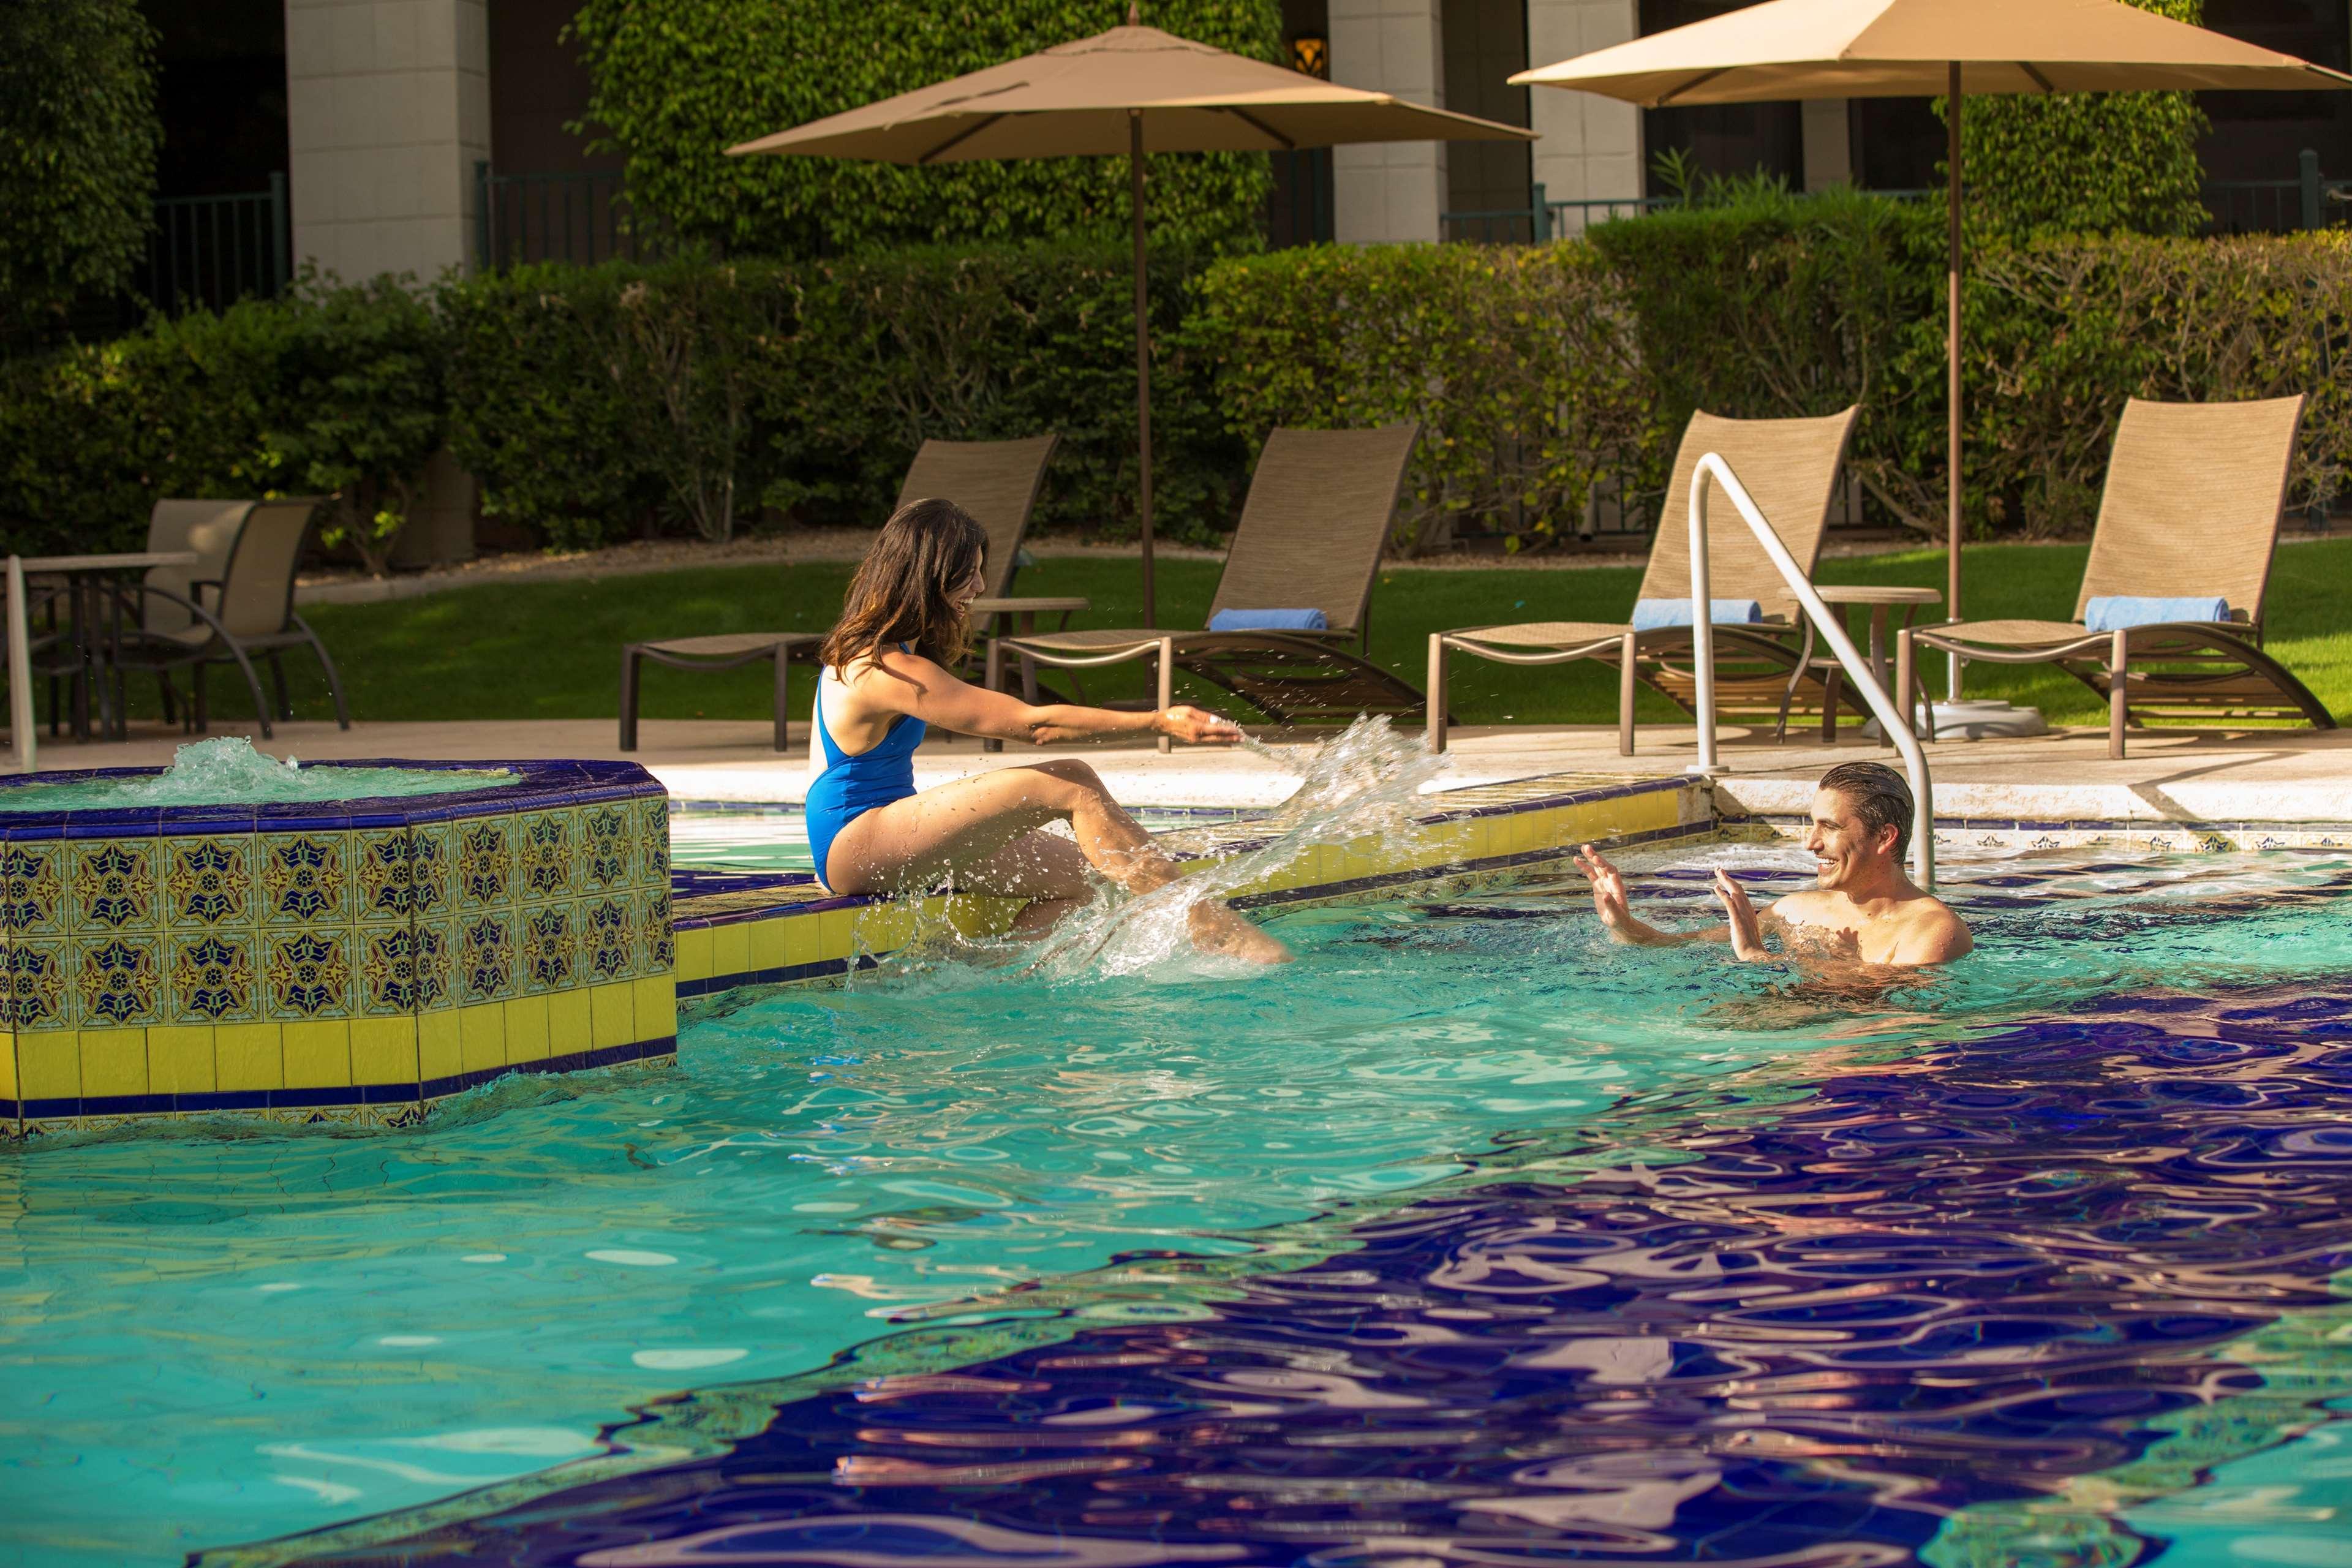 Arizona Biltmore, A Waldorf Astoria Resort 2400 East ...